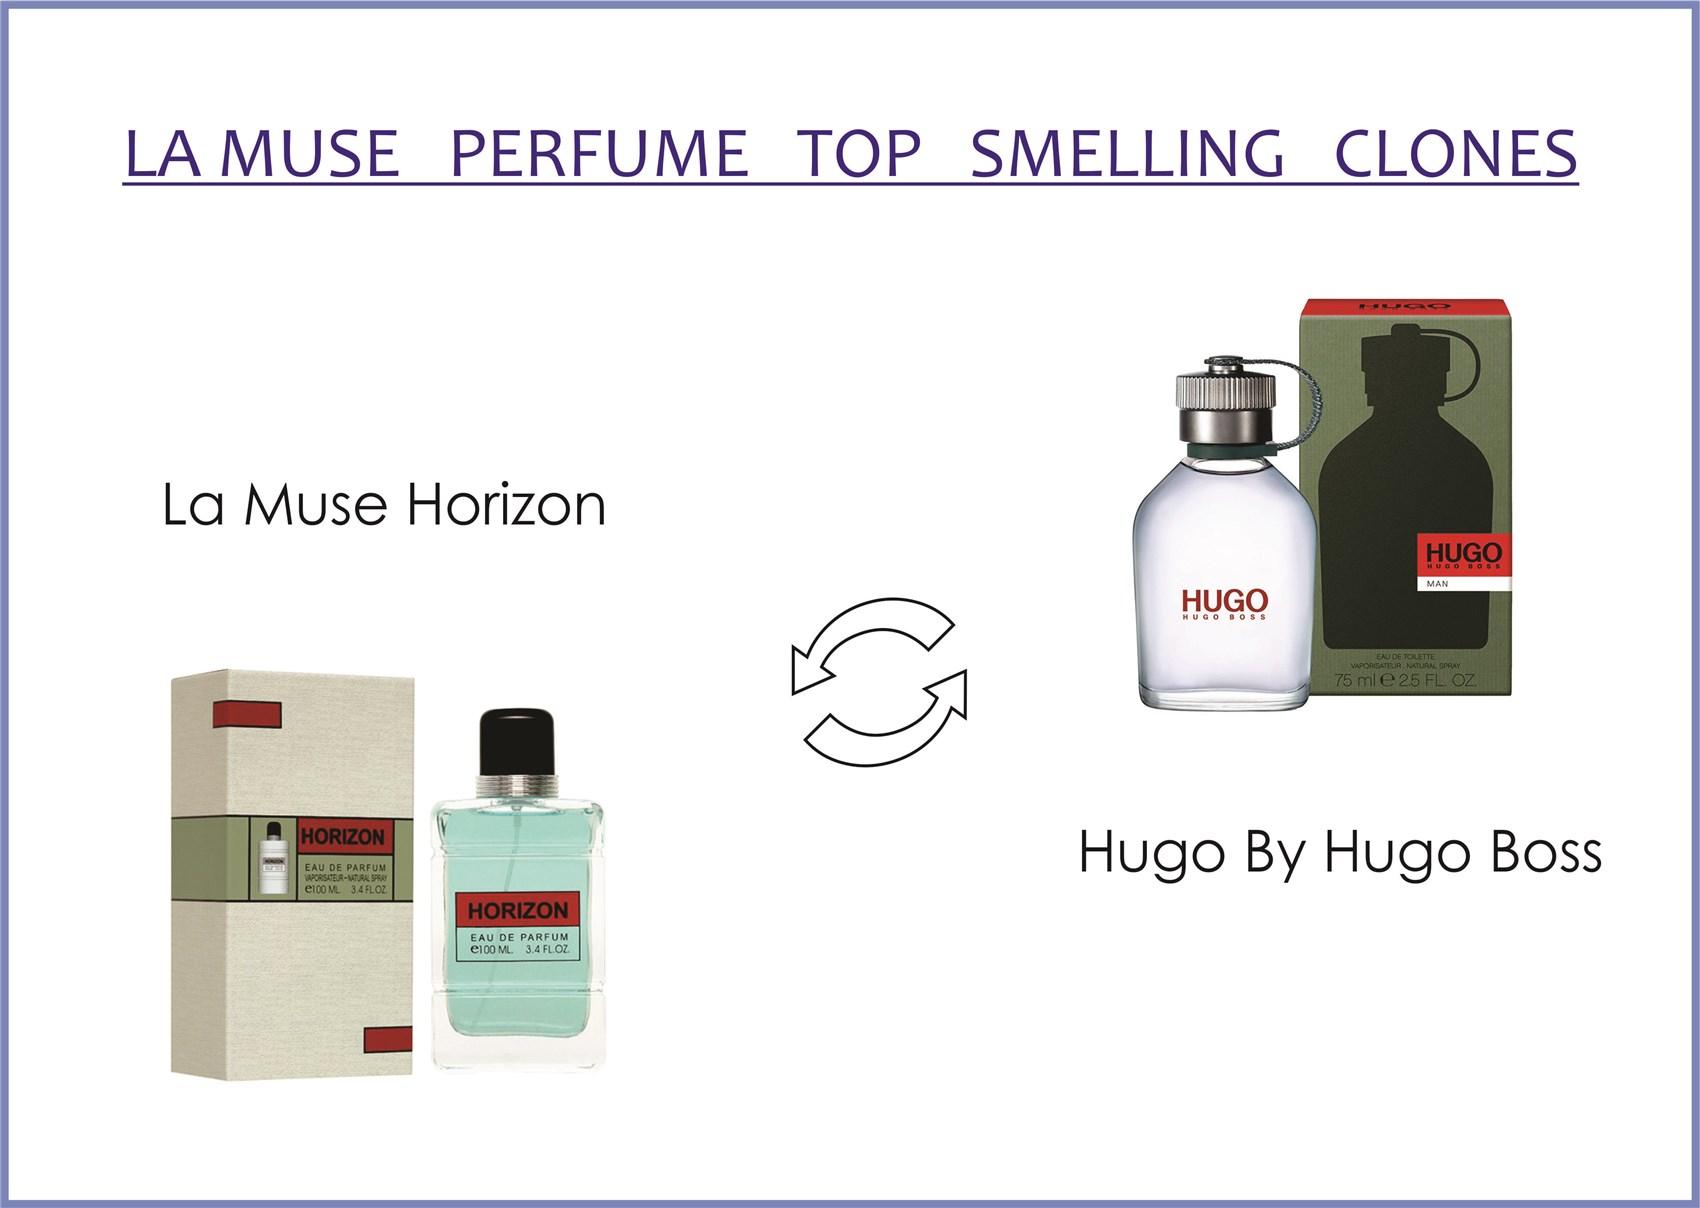 la-muse-horizon-for-men-100-ml-edp-by-lattafa-perfumes-hugo-boss-man-extreme-perfume-for-man-100-ml-edp